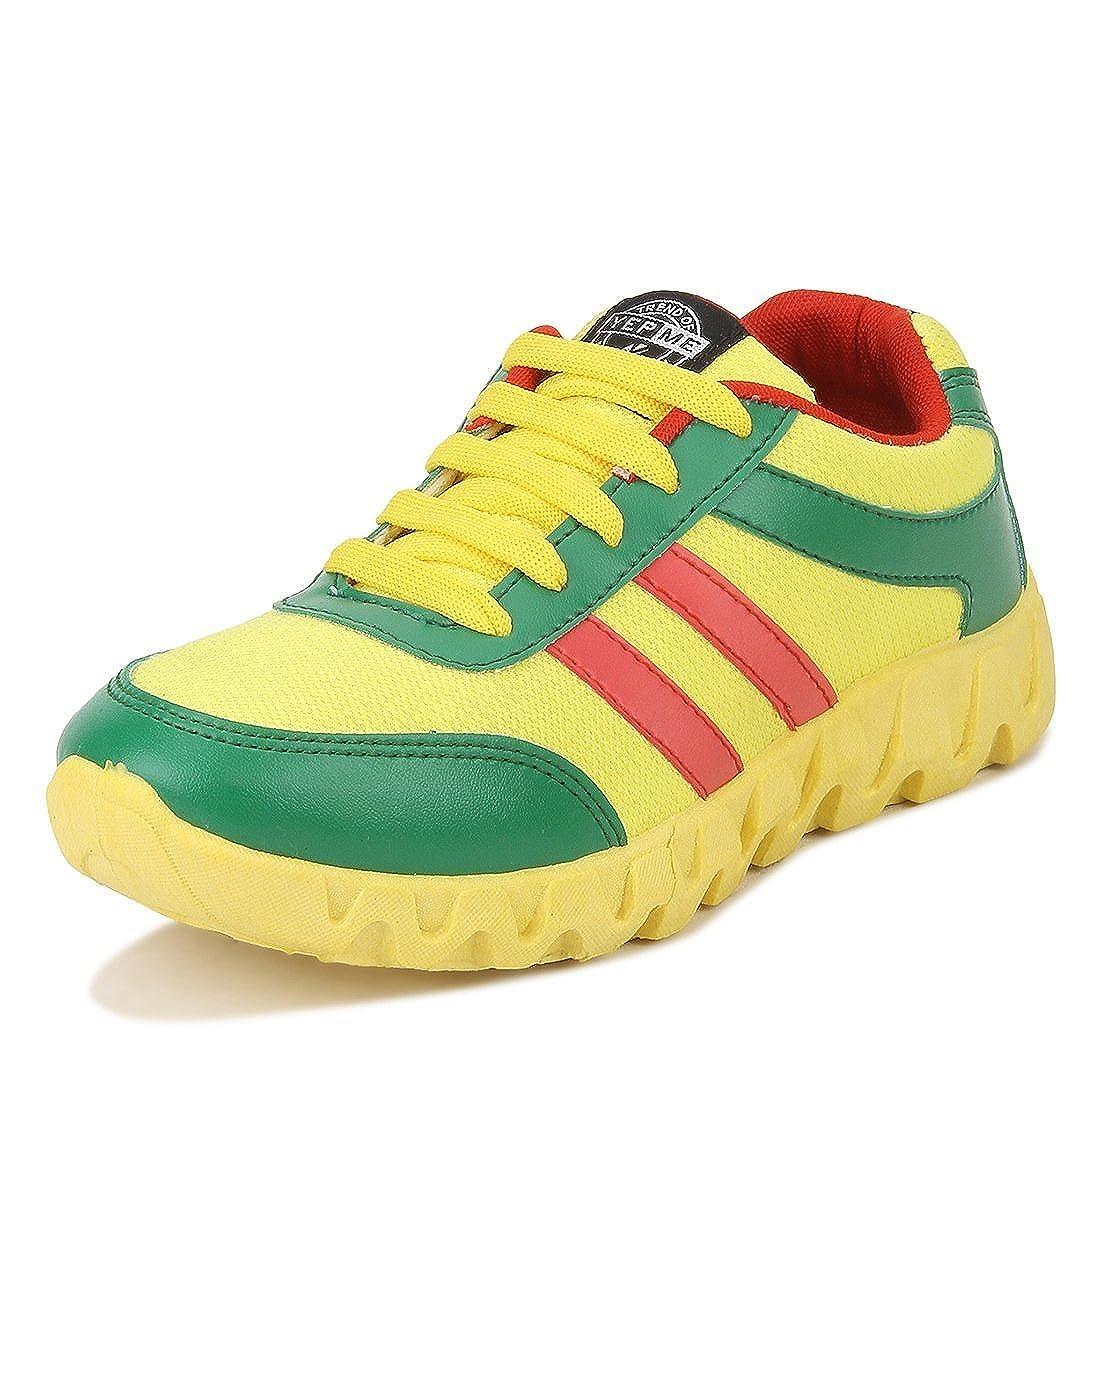 Yepme Men's Yellow Canvas Casual Shoes